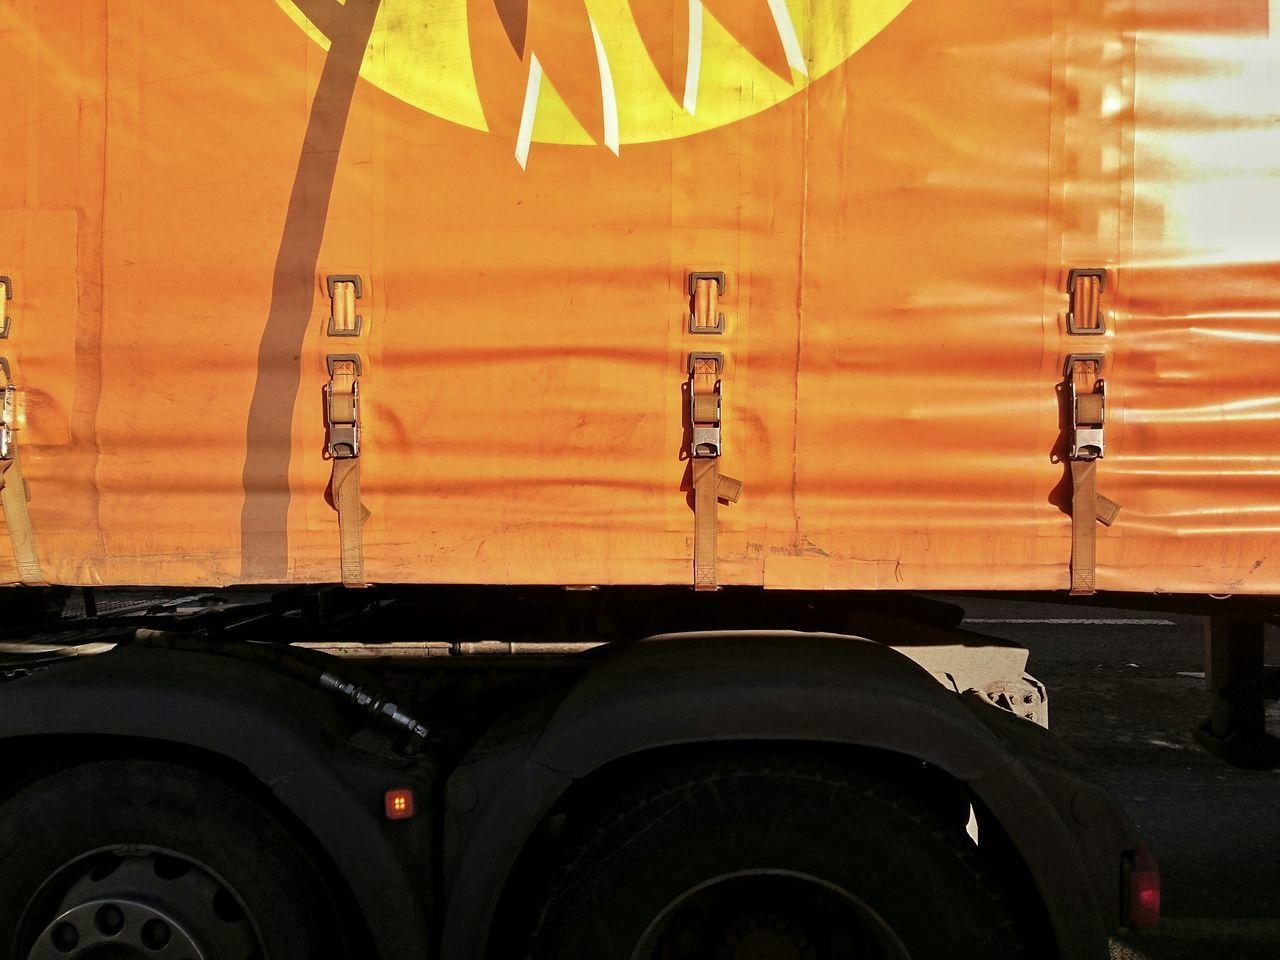 Cropped Image Of Orange Semi-Truck